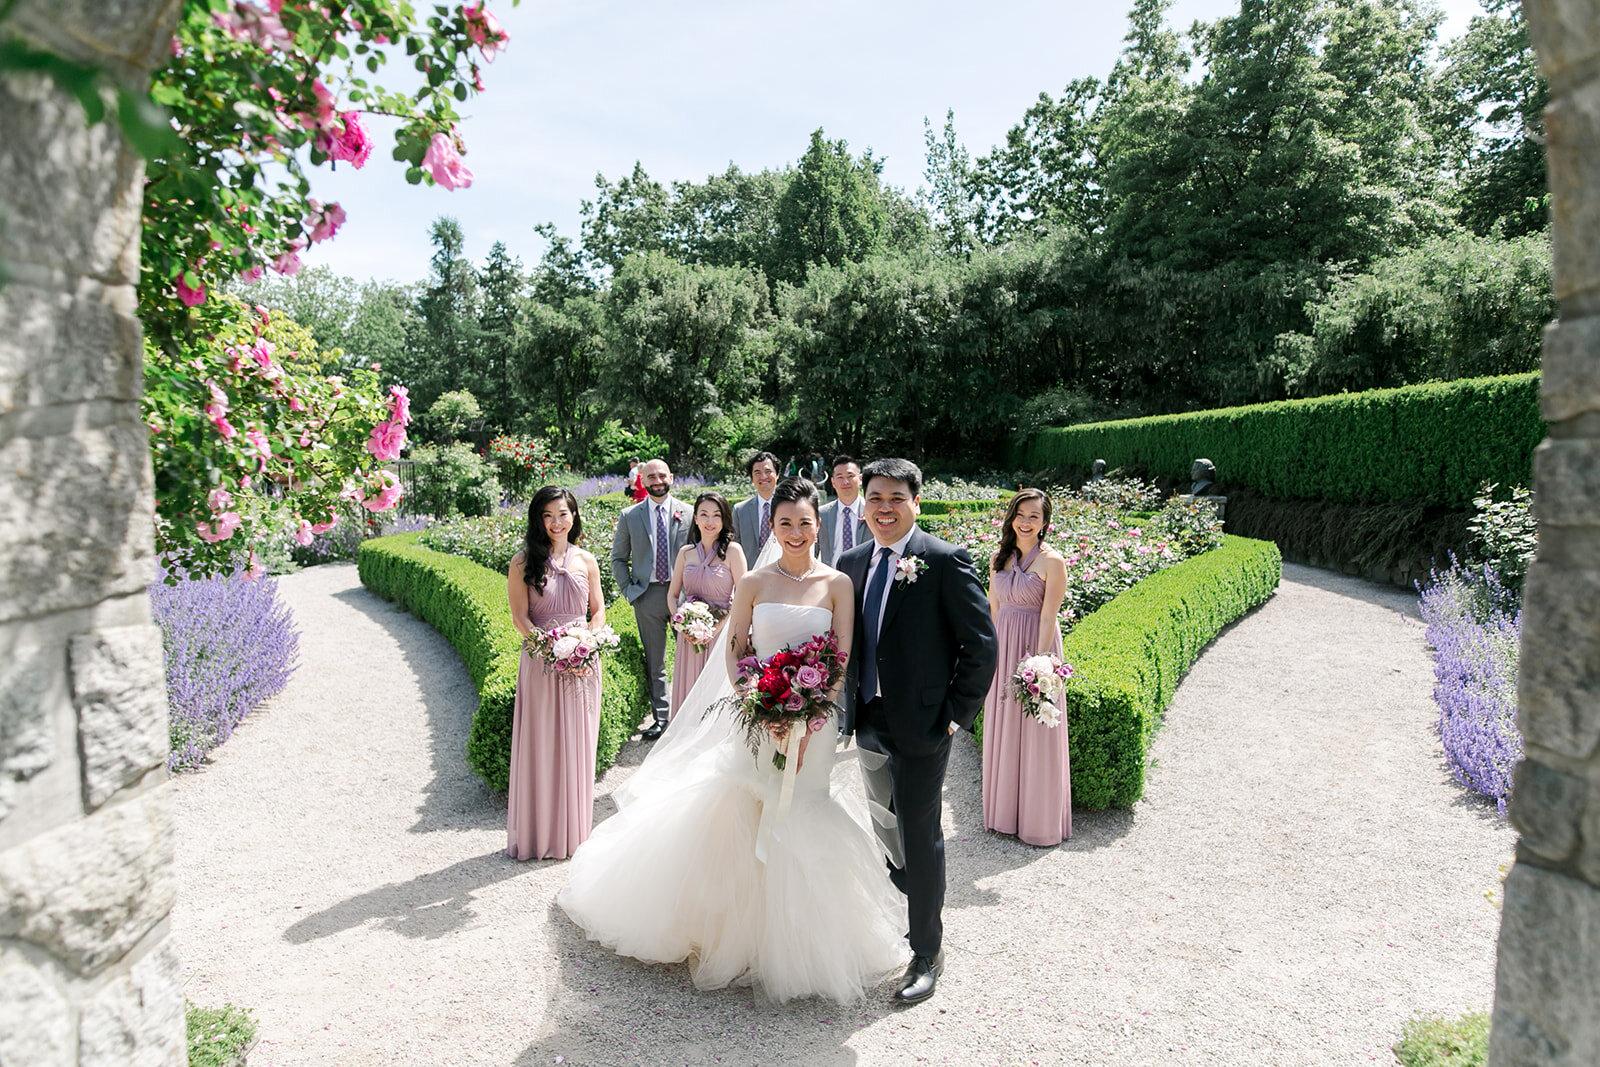 Jessica & Alex JW Marriott Parq Wedding. Wedding Party photos at Vandusen Gardens. Beautiful manicured garden and the bridesmaids in mauve purple matching dresses   Keepsake Events